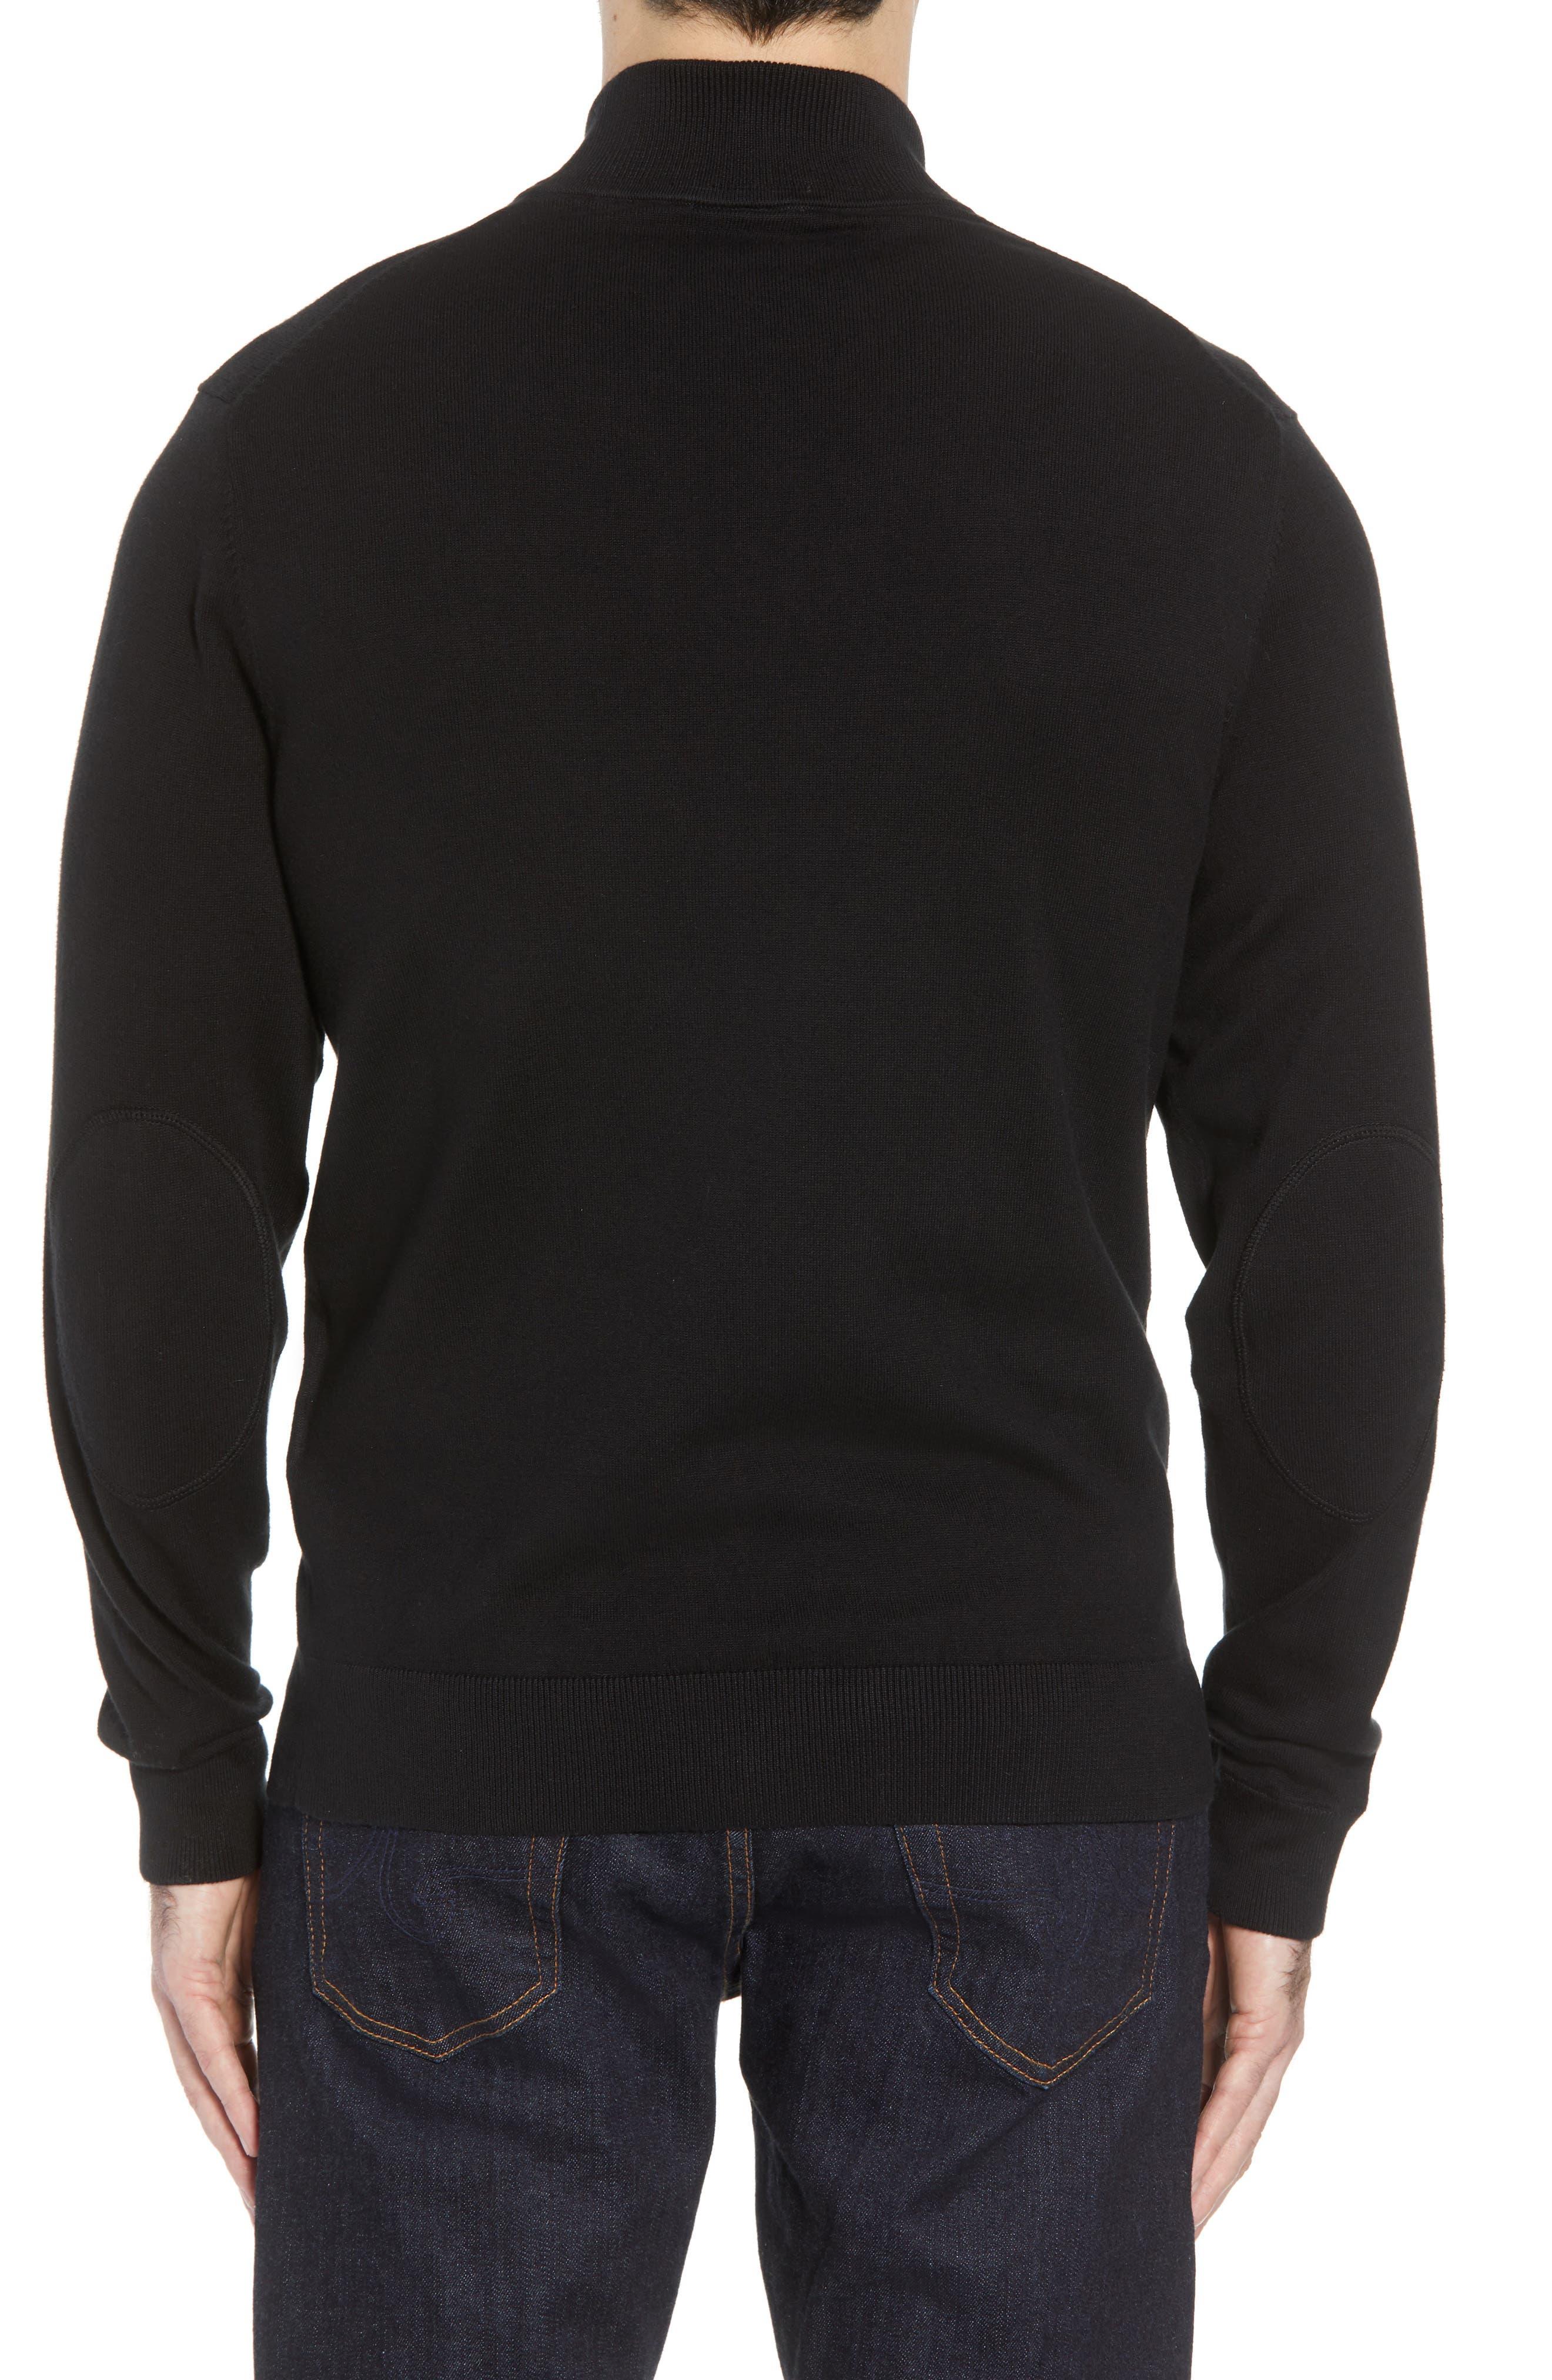 Jacksonville Jaguars - Lakemont Regular Fit Quarter Zip Sweater,                             Alternate thumbnail 2, color,                             BLACK